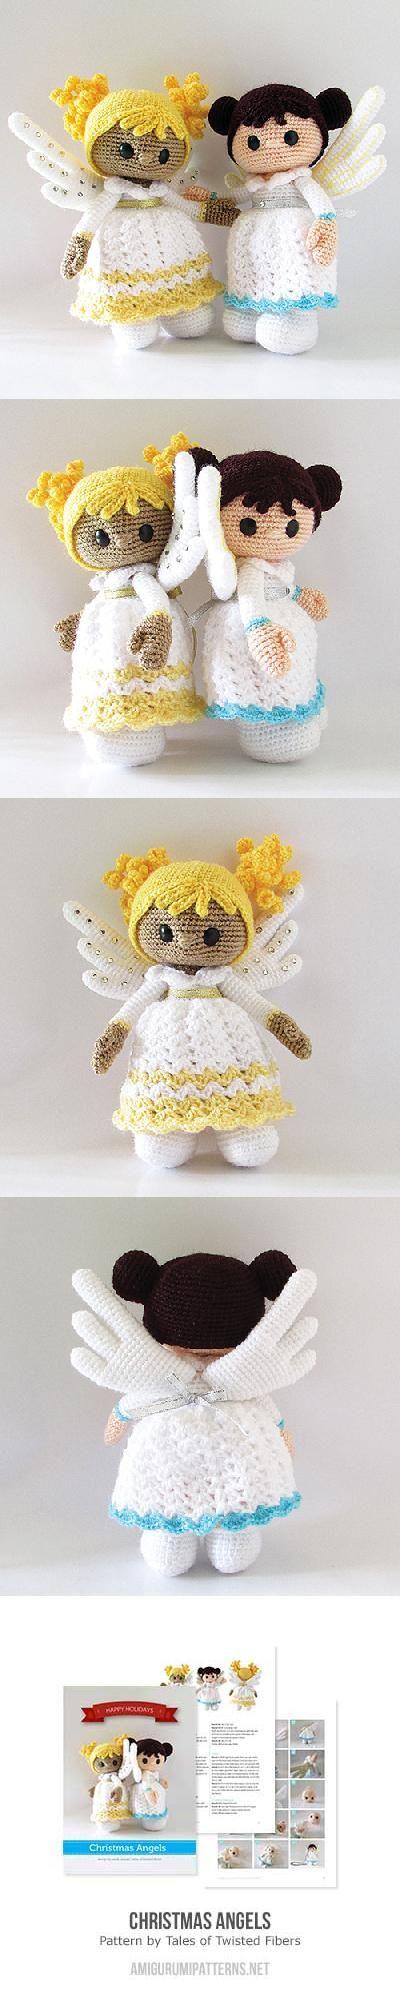 141 best angel images on Pinterest   Amigurumi doll, Crochet toys ...